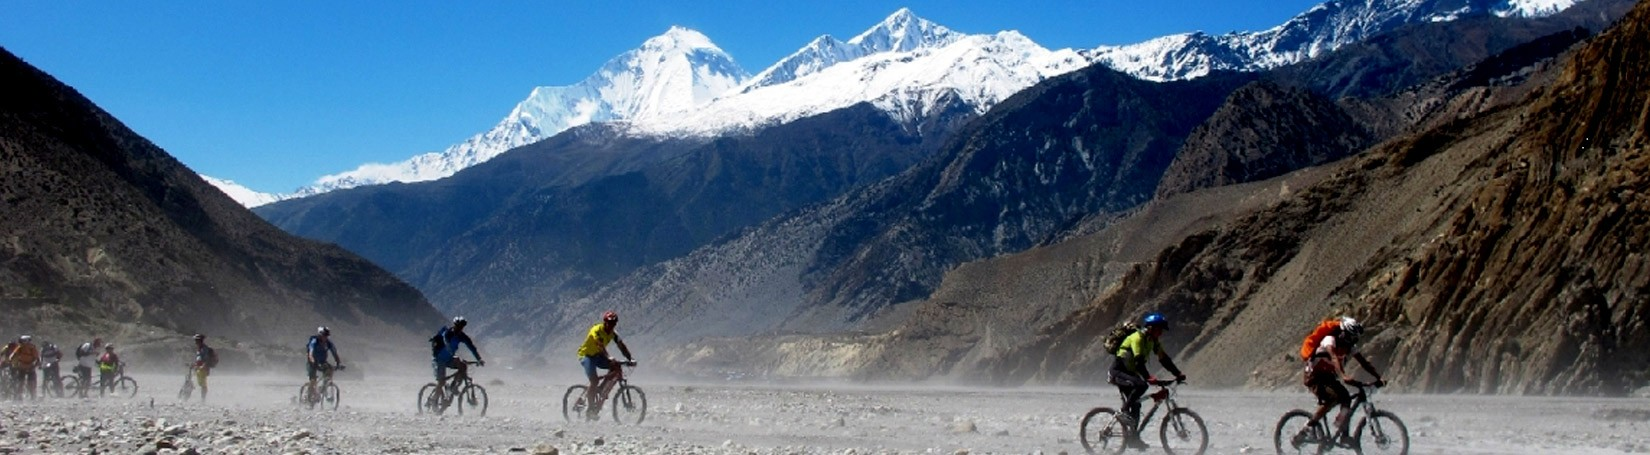 Cycing Annapurna Lower Mustang